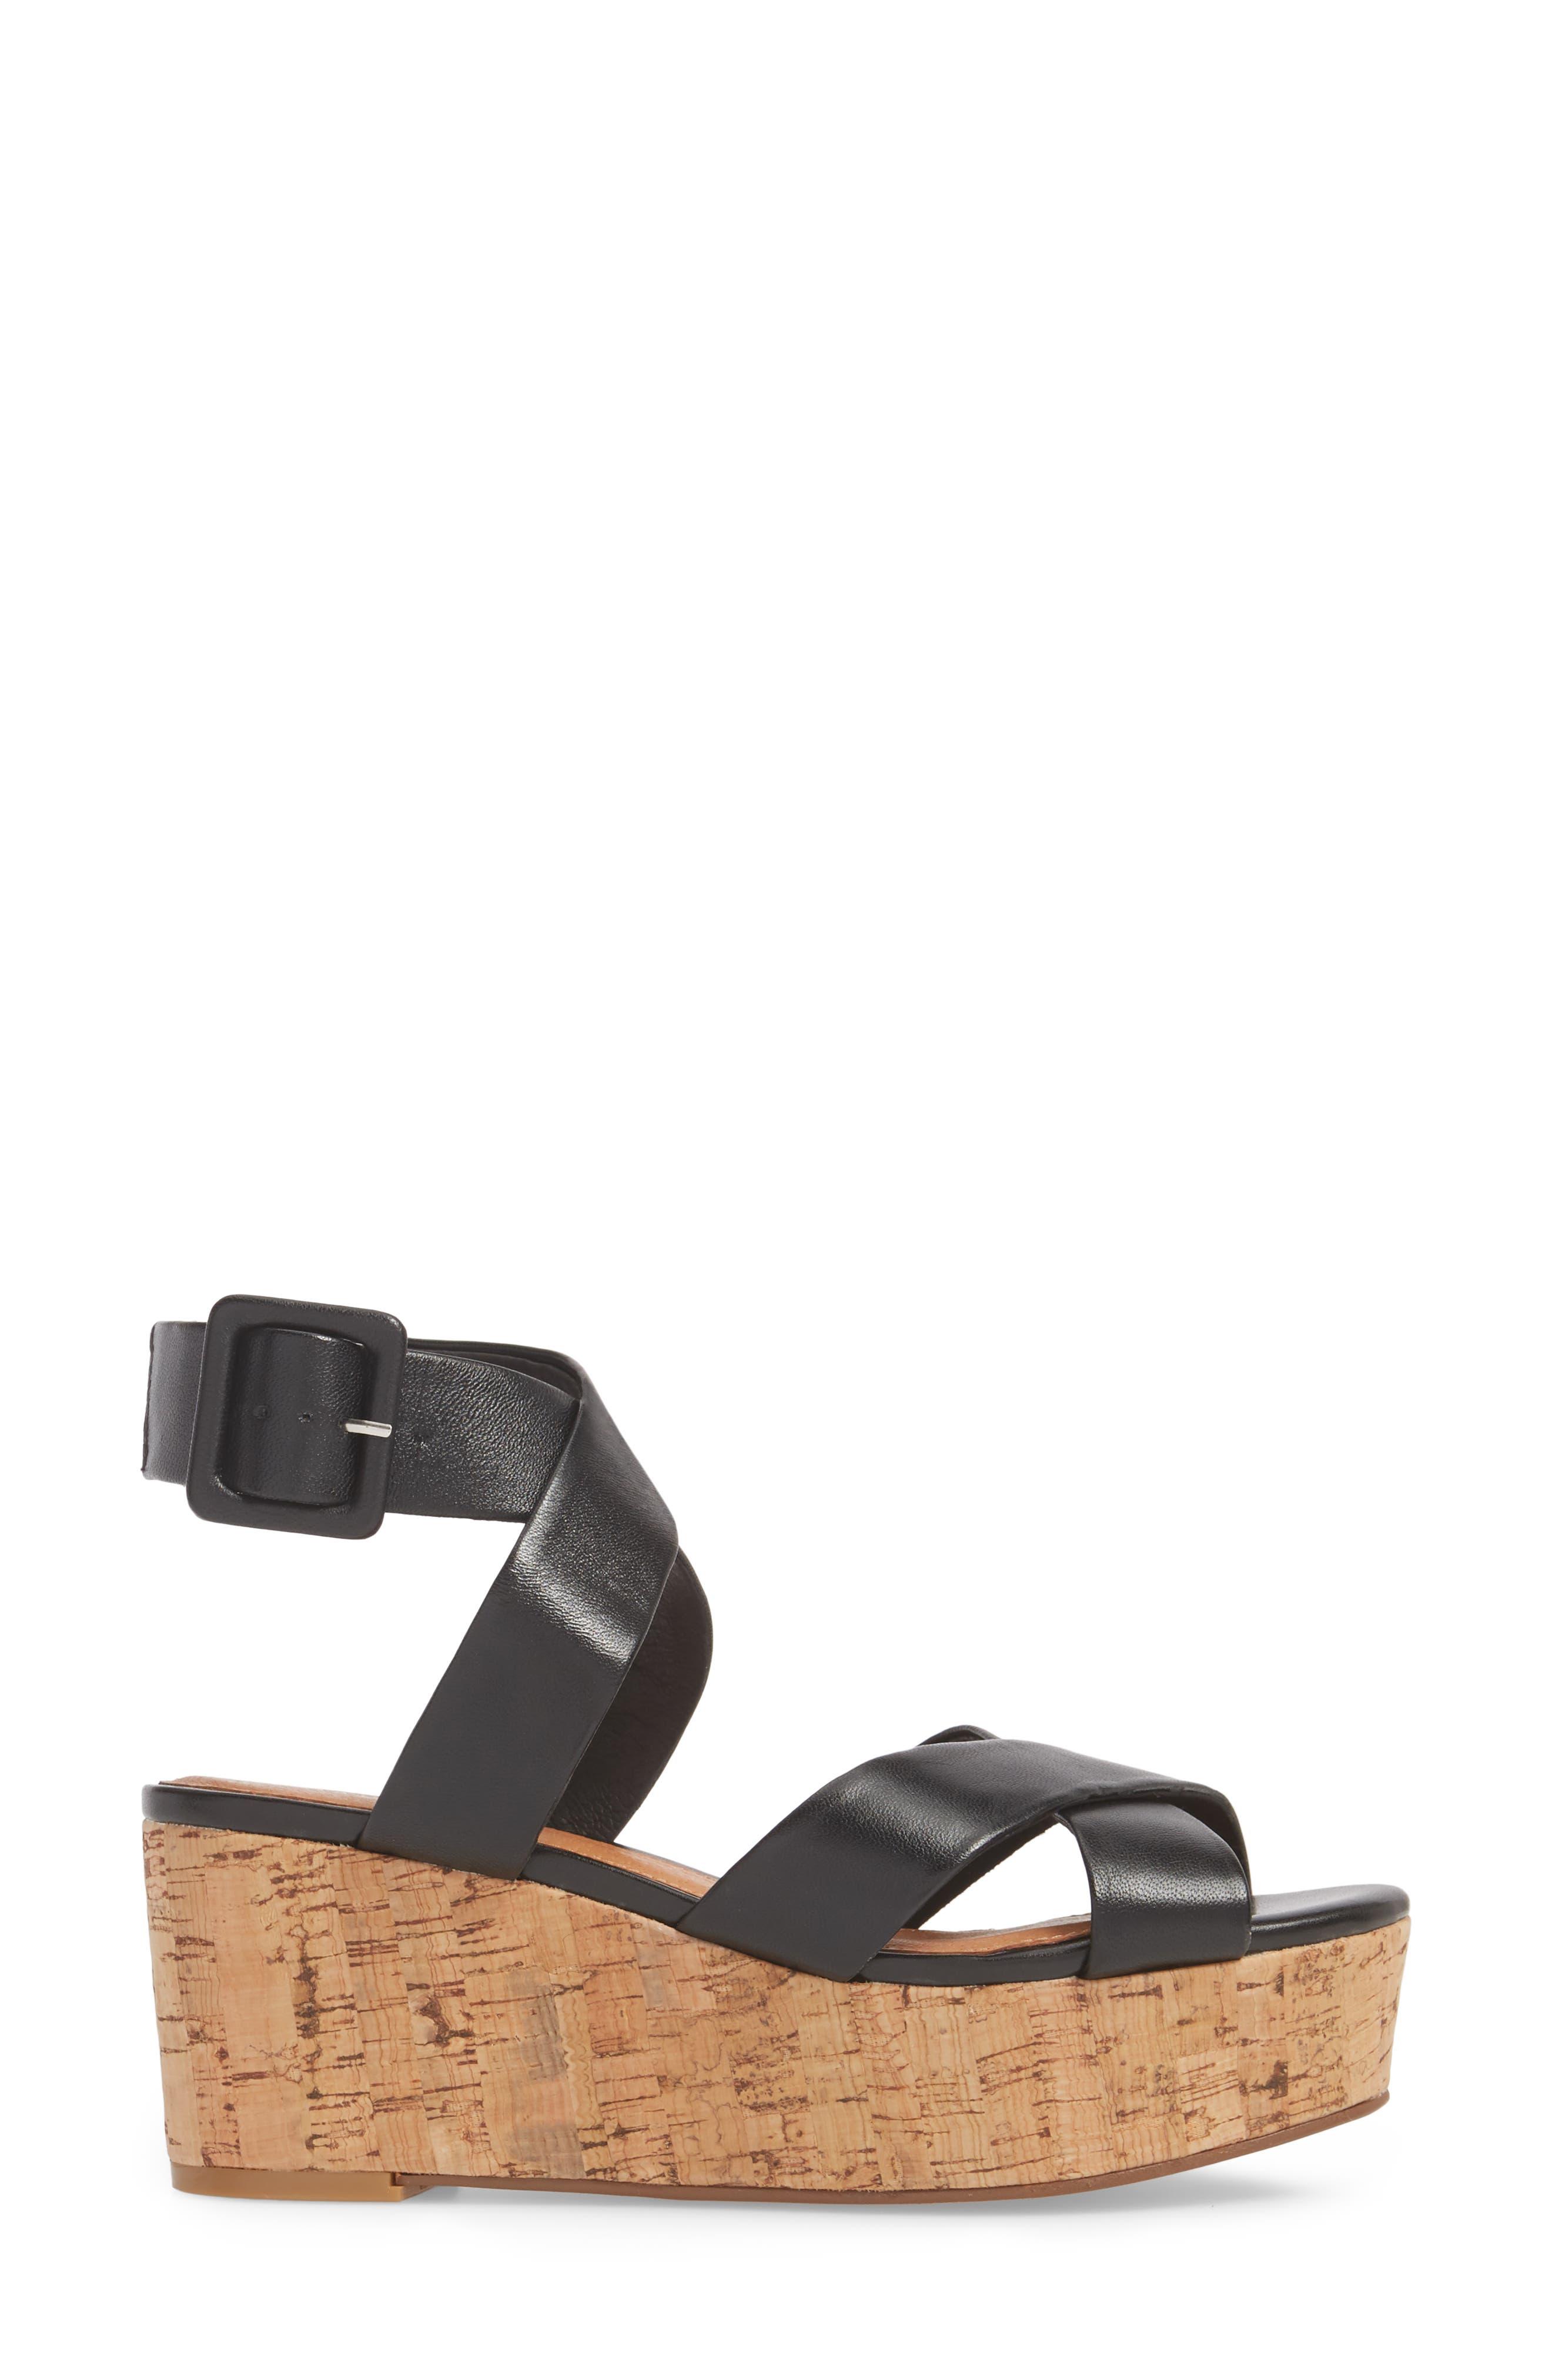 Evie Platform Wedge Sandal,                             Alternate thumbnail 5, color,